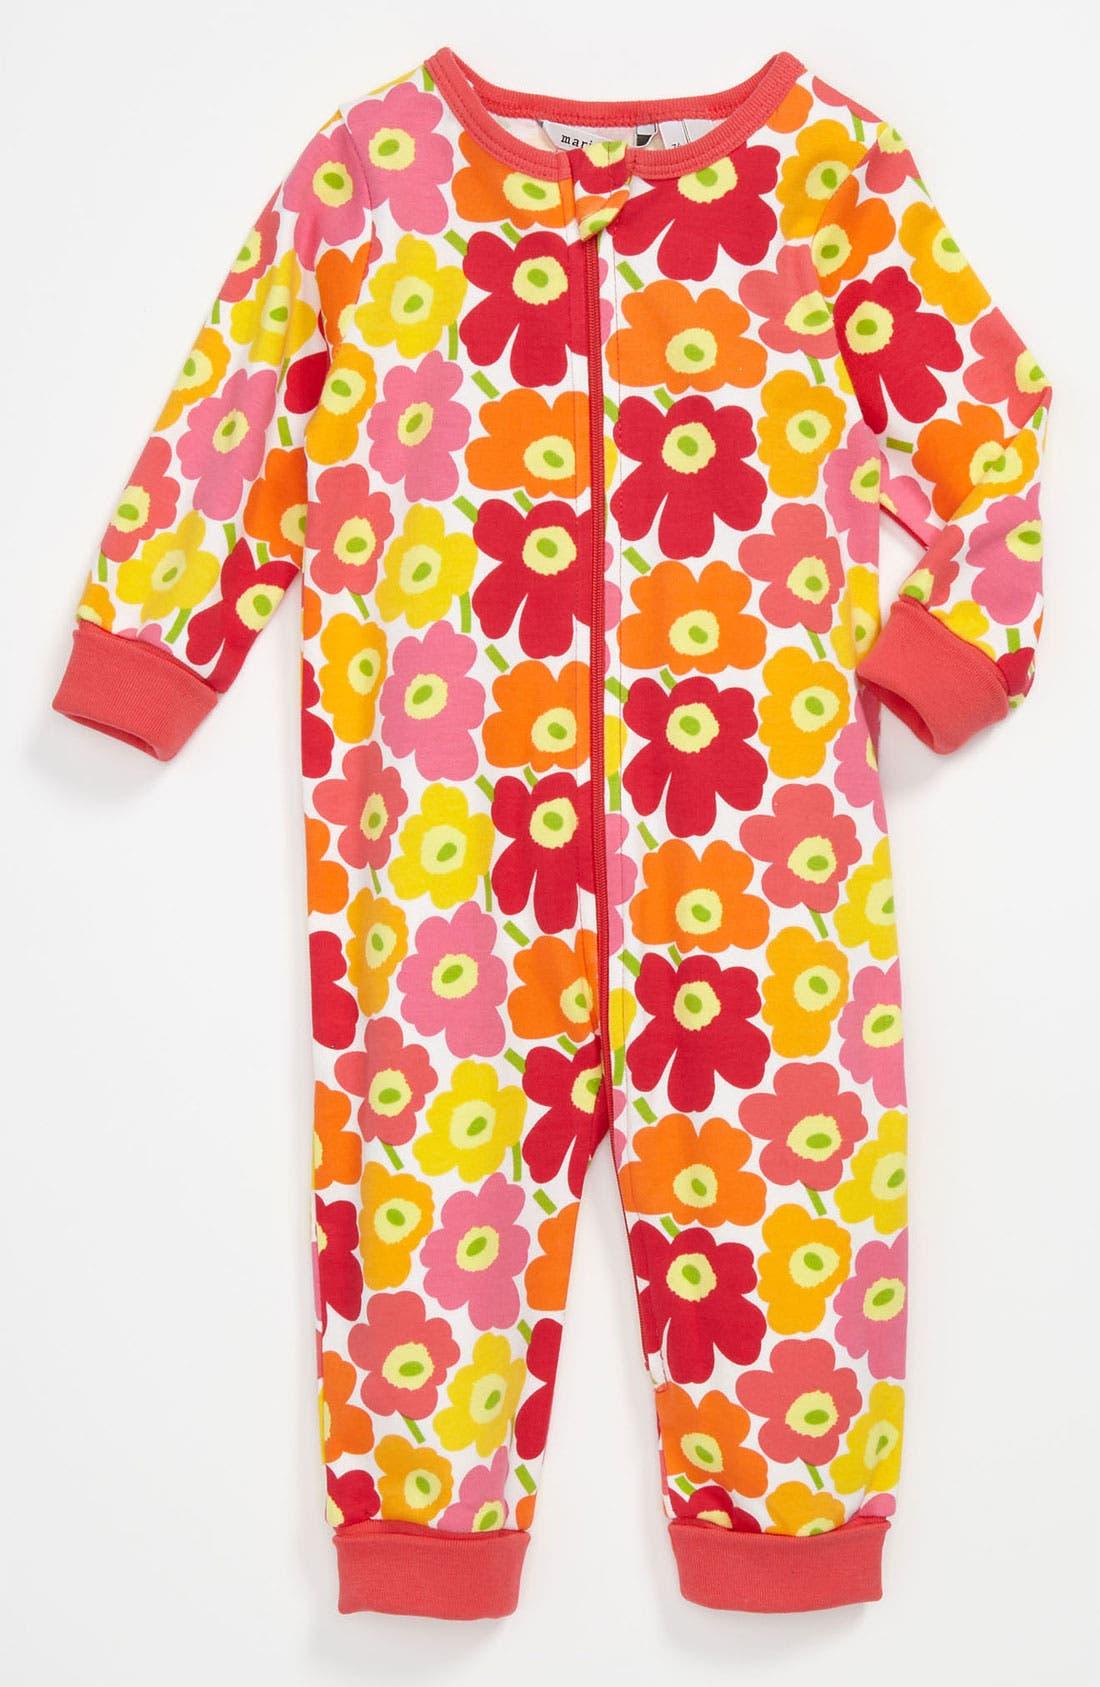 Main Image - Marimekko 'Unikko' Print Coveralls (Infant)